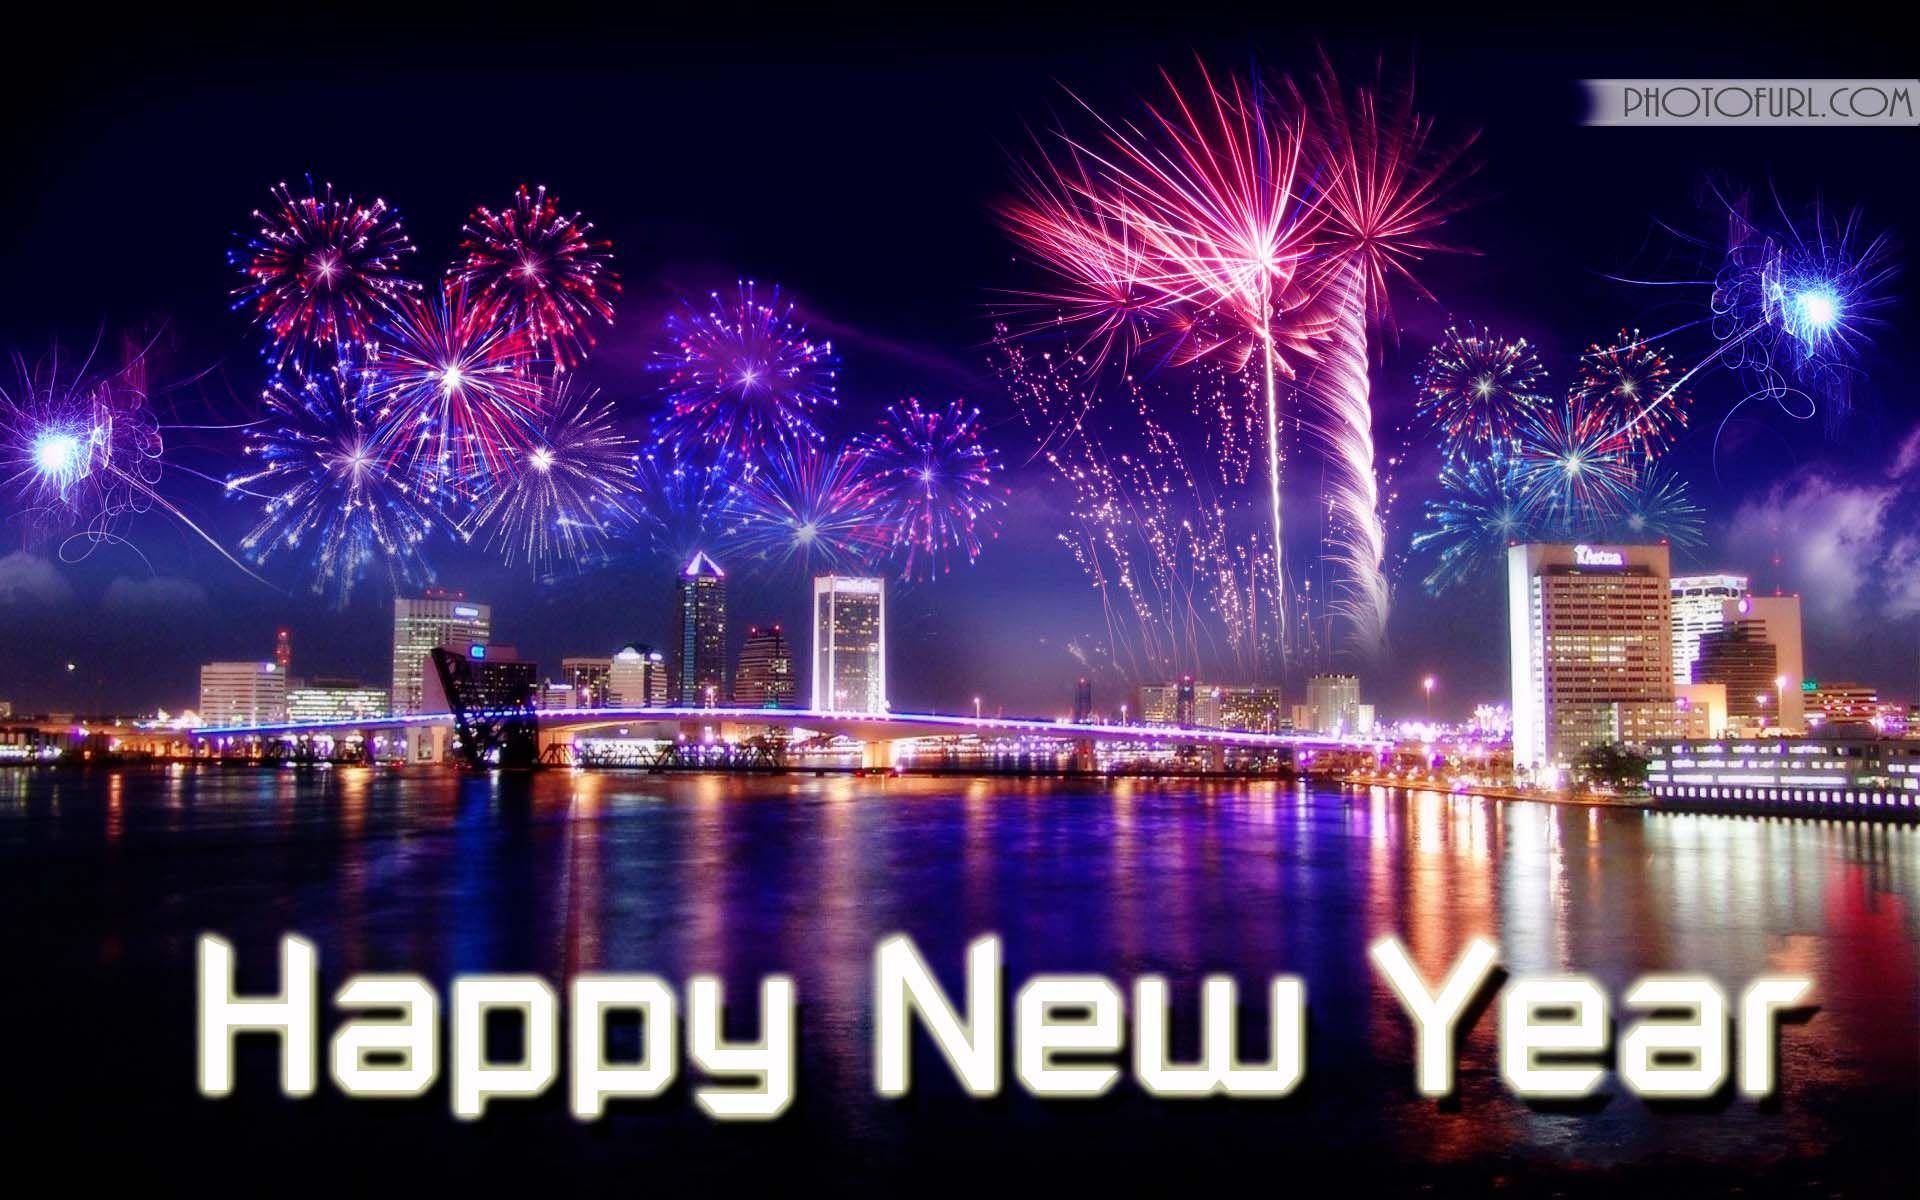 Desktop Backgrounds · Happy New Year Jennys Noodle